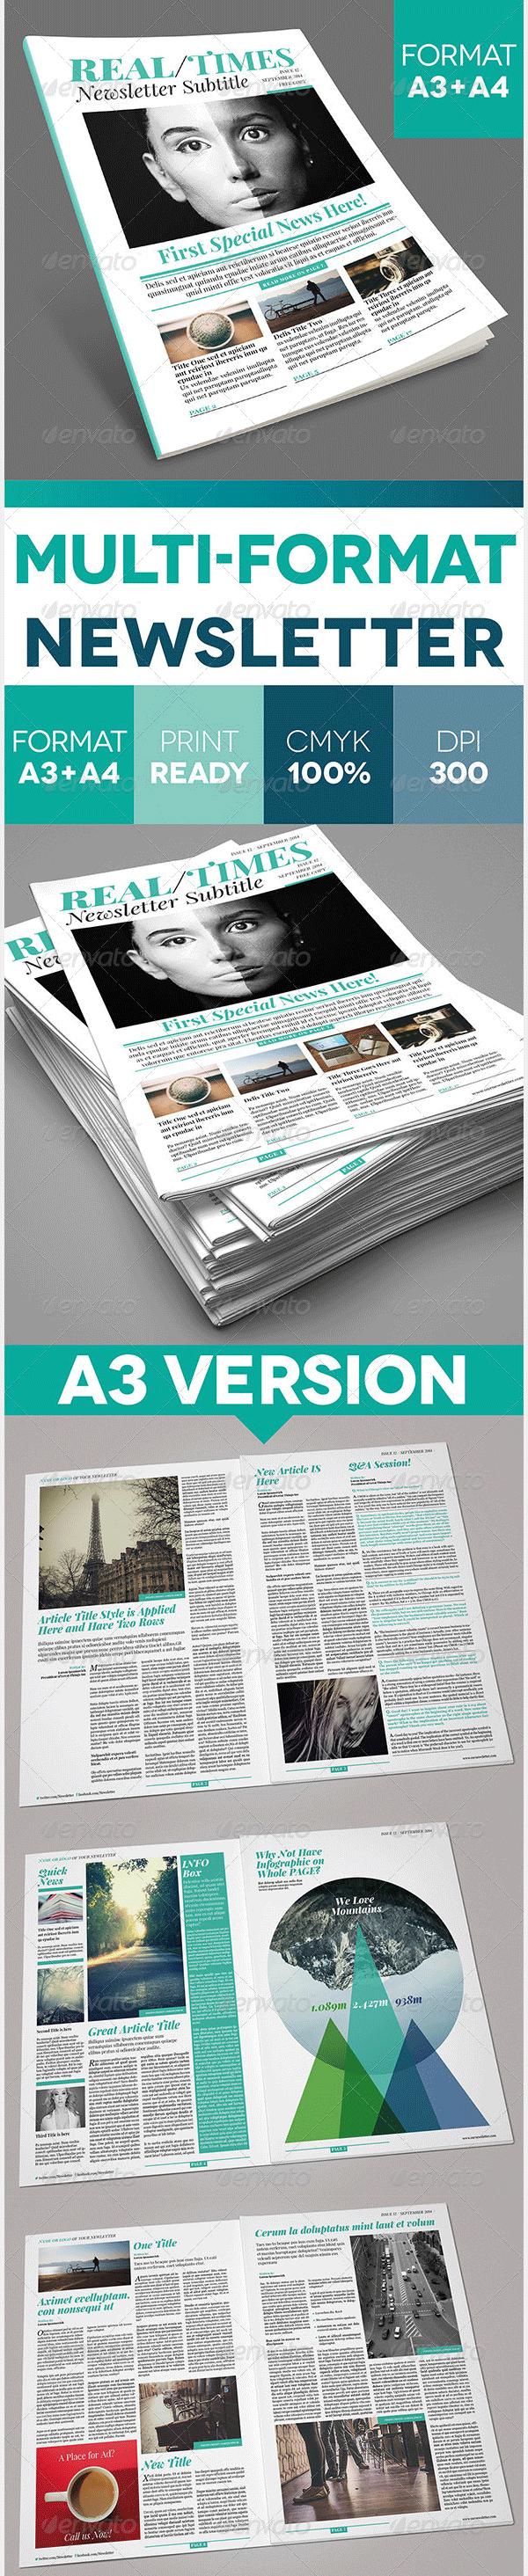 multi format newslette